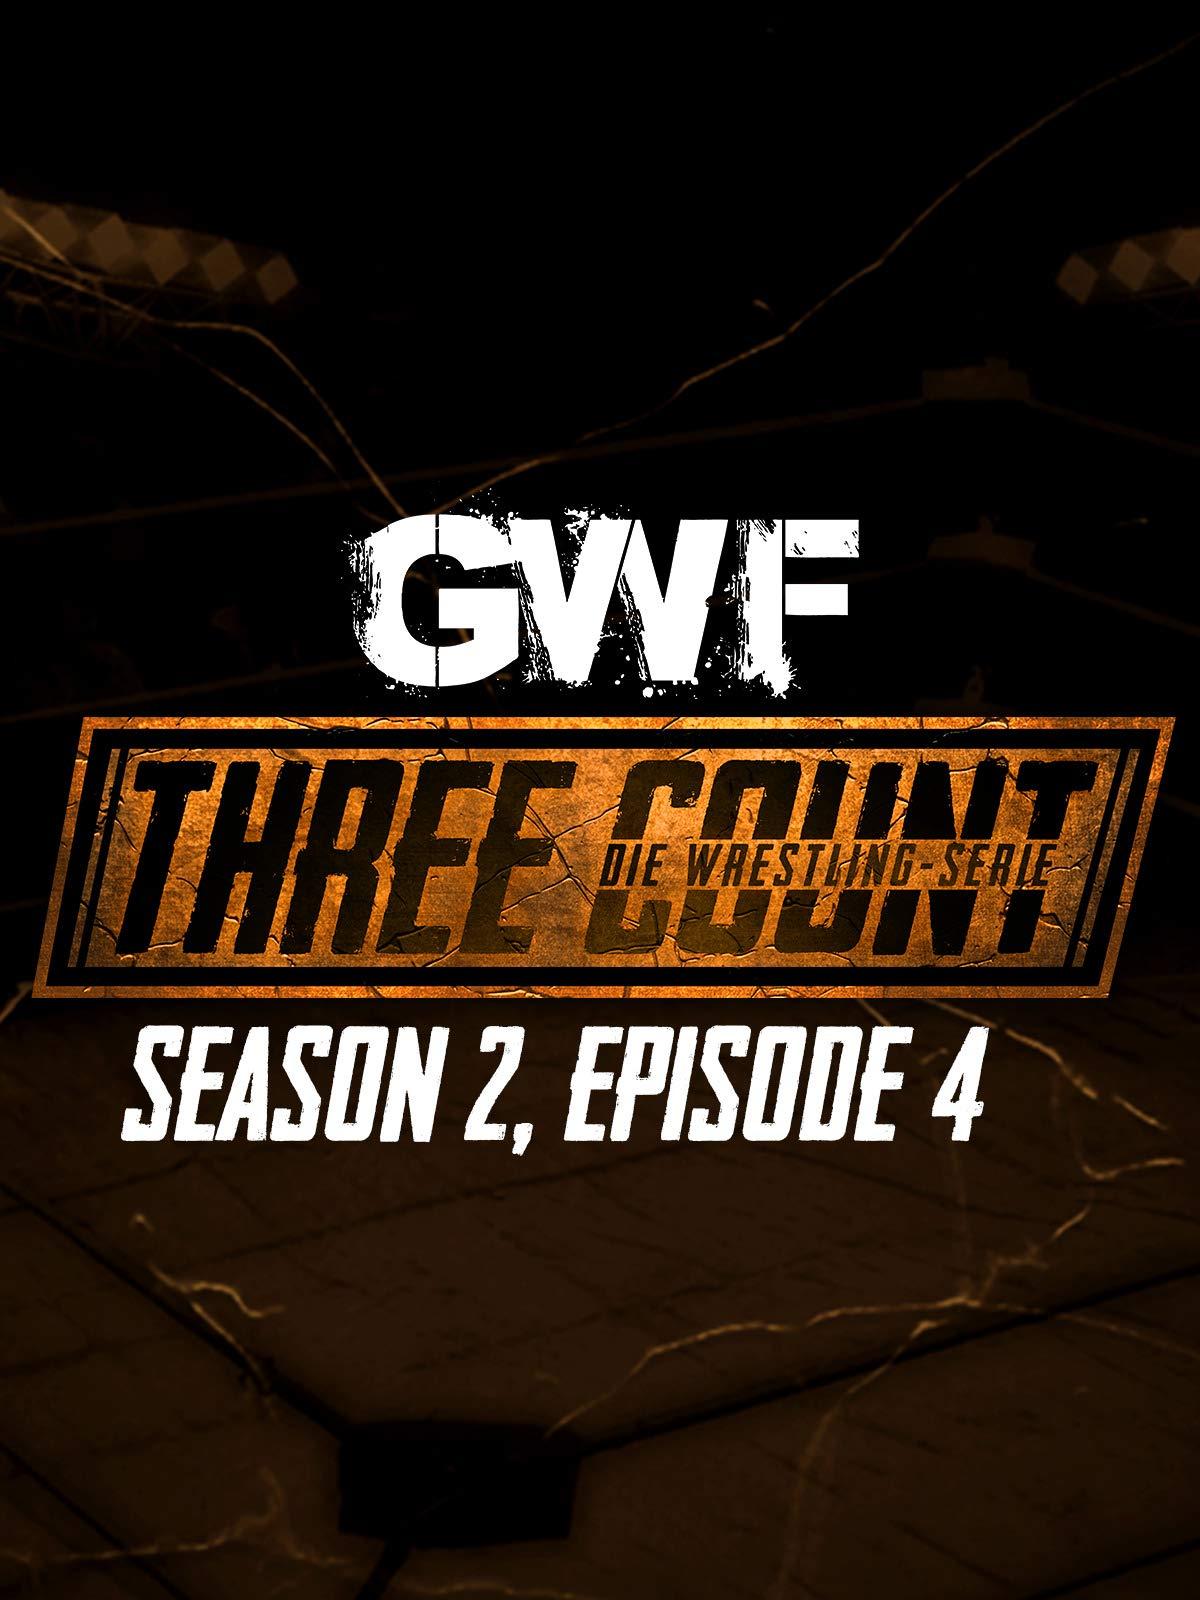 GWF Three Count - Die Wrestling-Serie, Season 2, Episode 4 on Amazon Prime Video UK